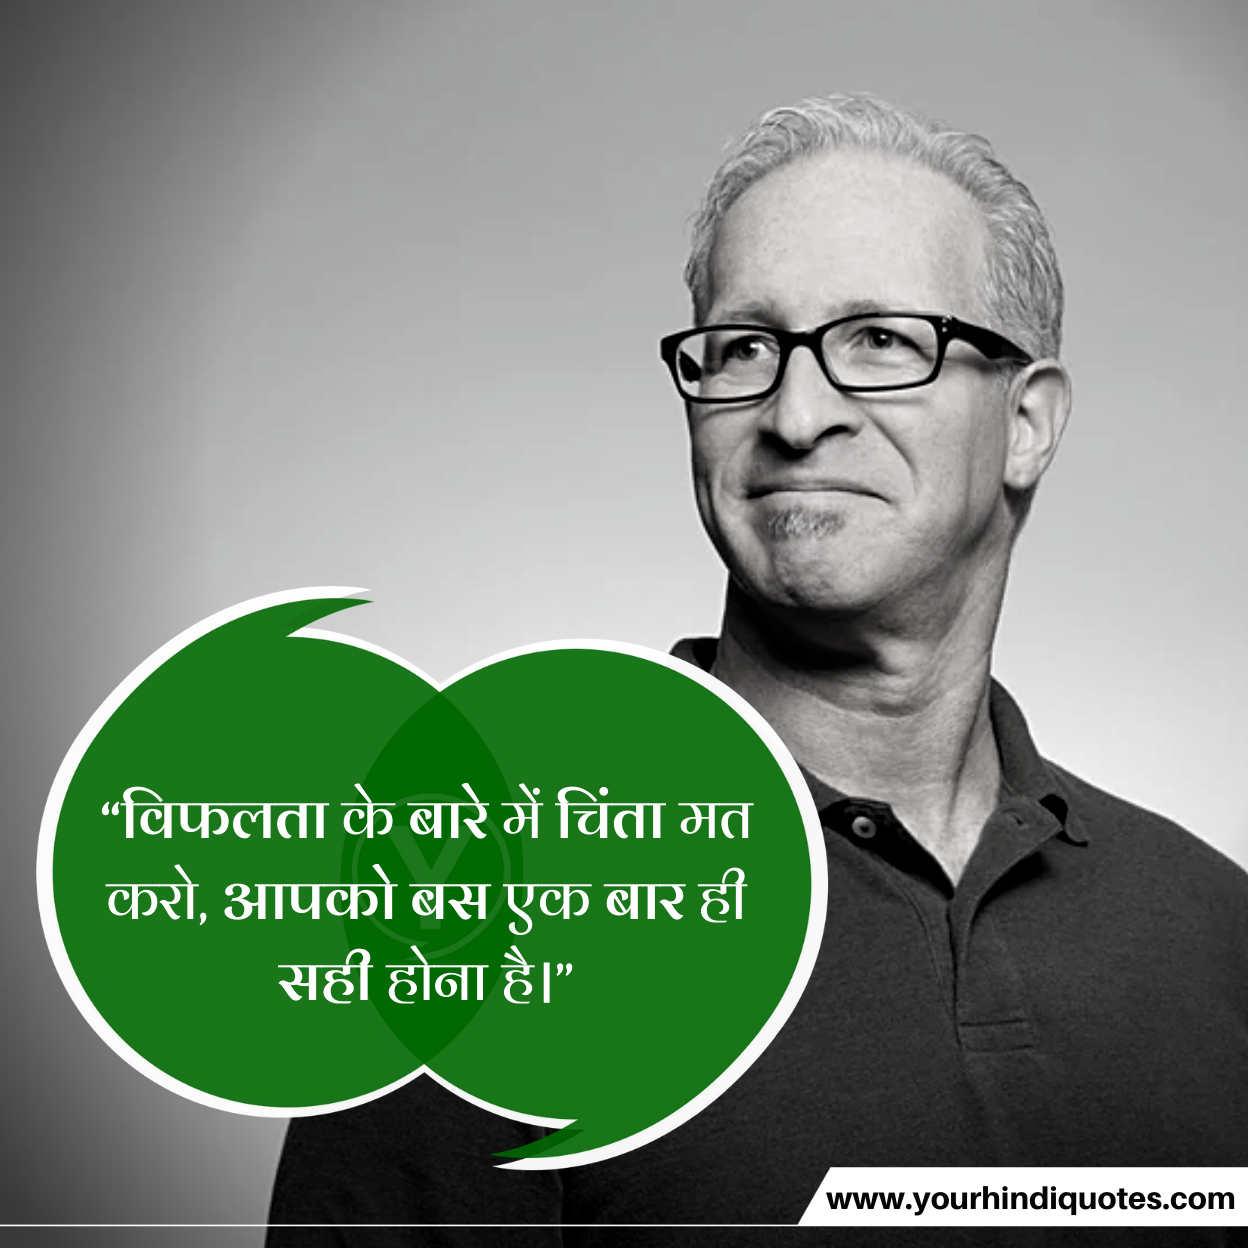 Motivational Thoughts Hindi Image